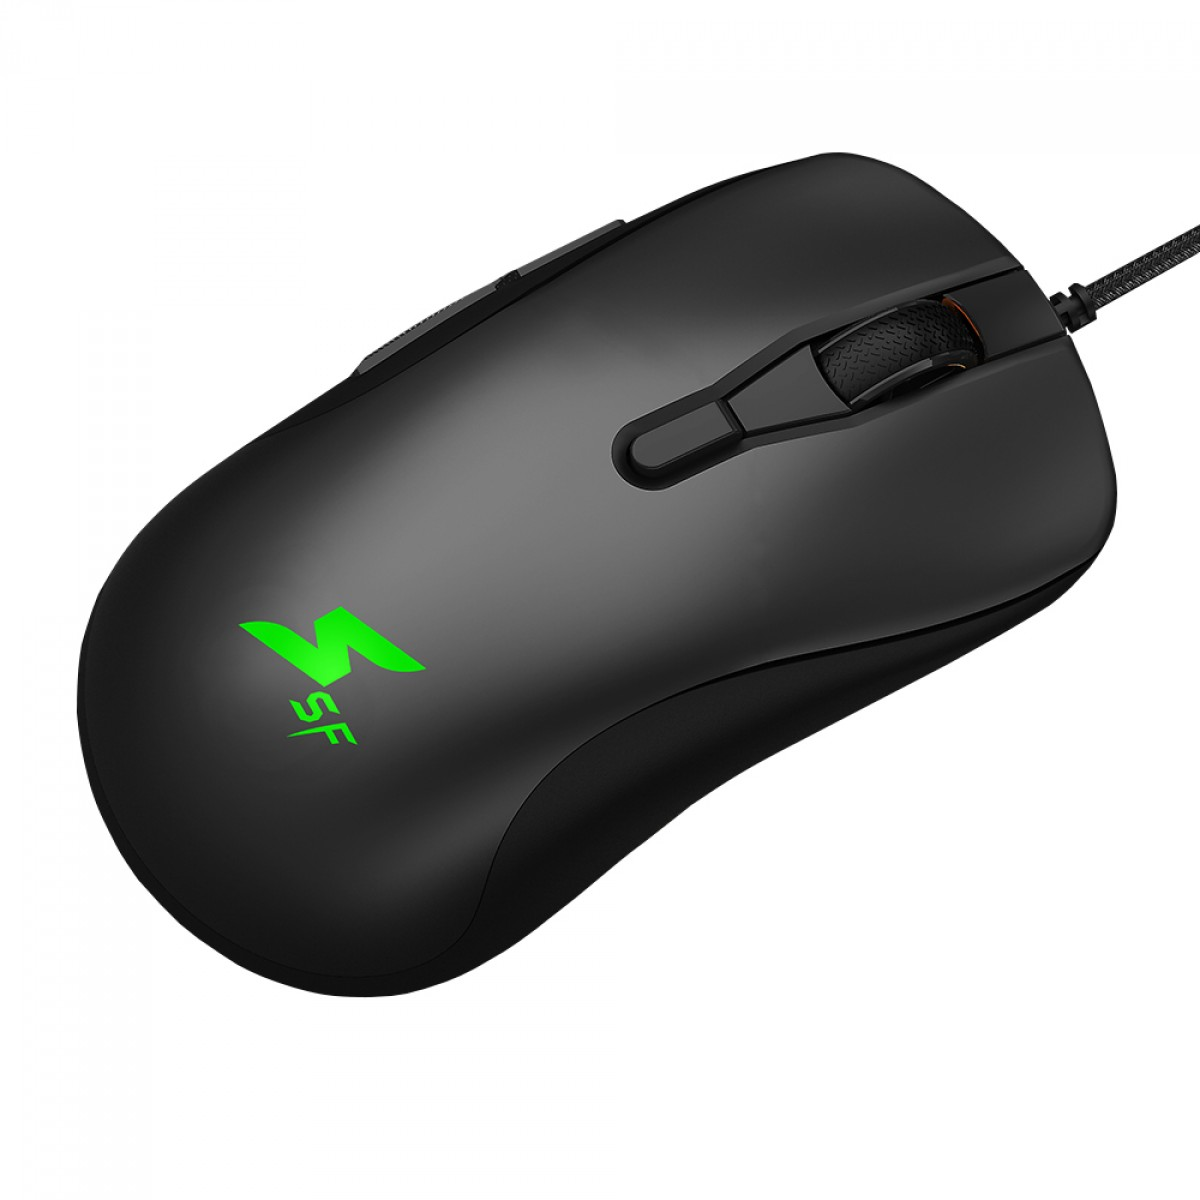 Mouse Gamer SuperFrame FOFLIS, RGB, 7 Botões, Black